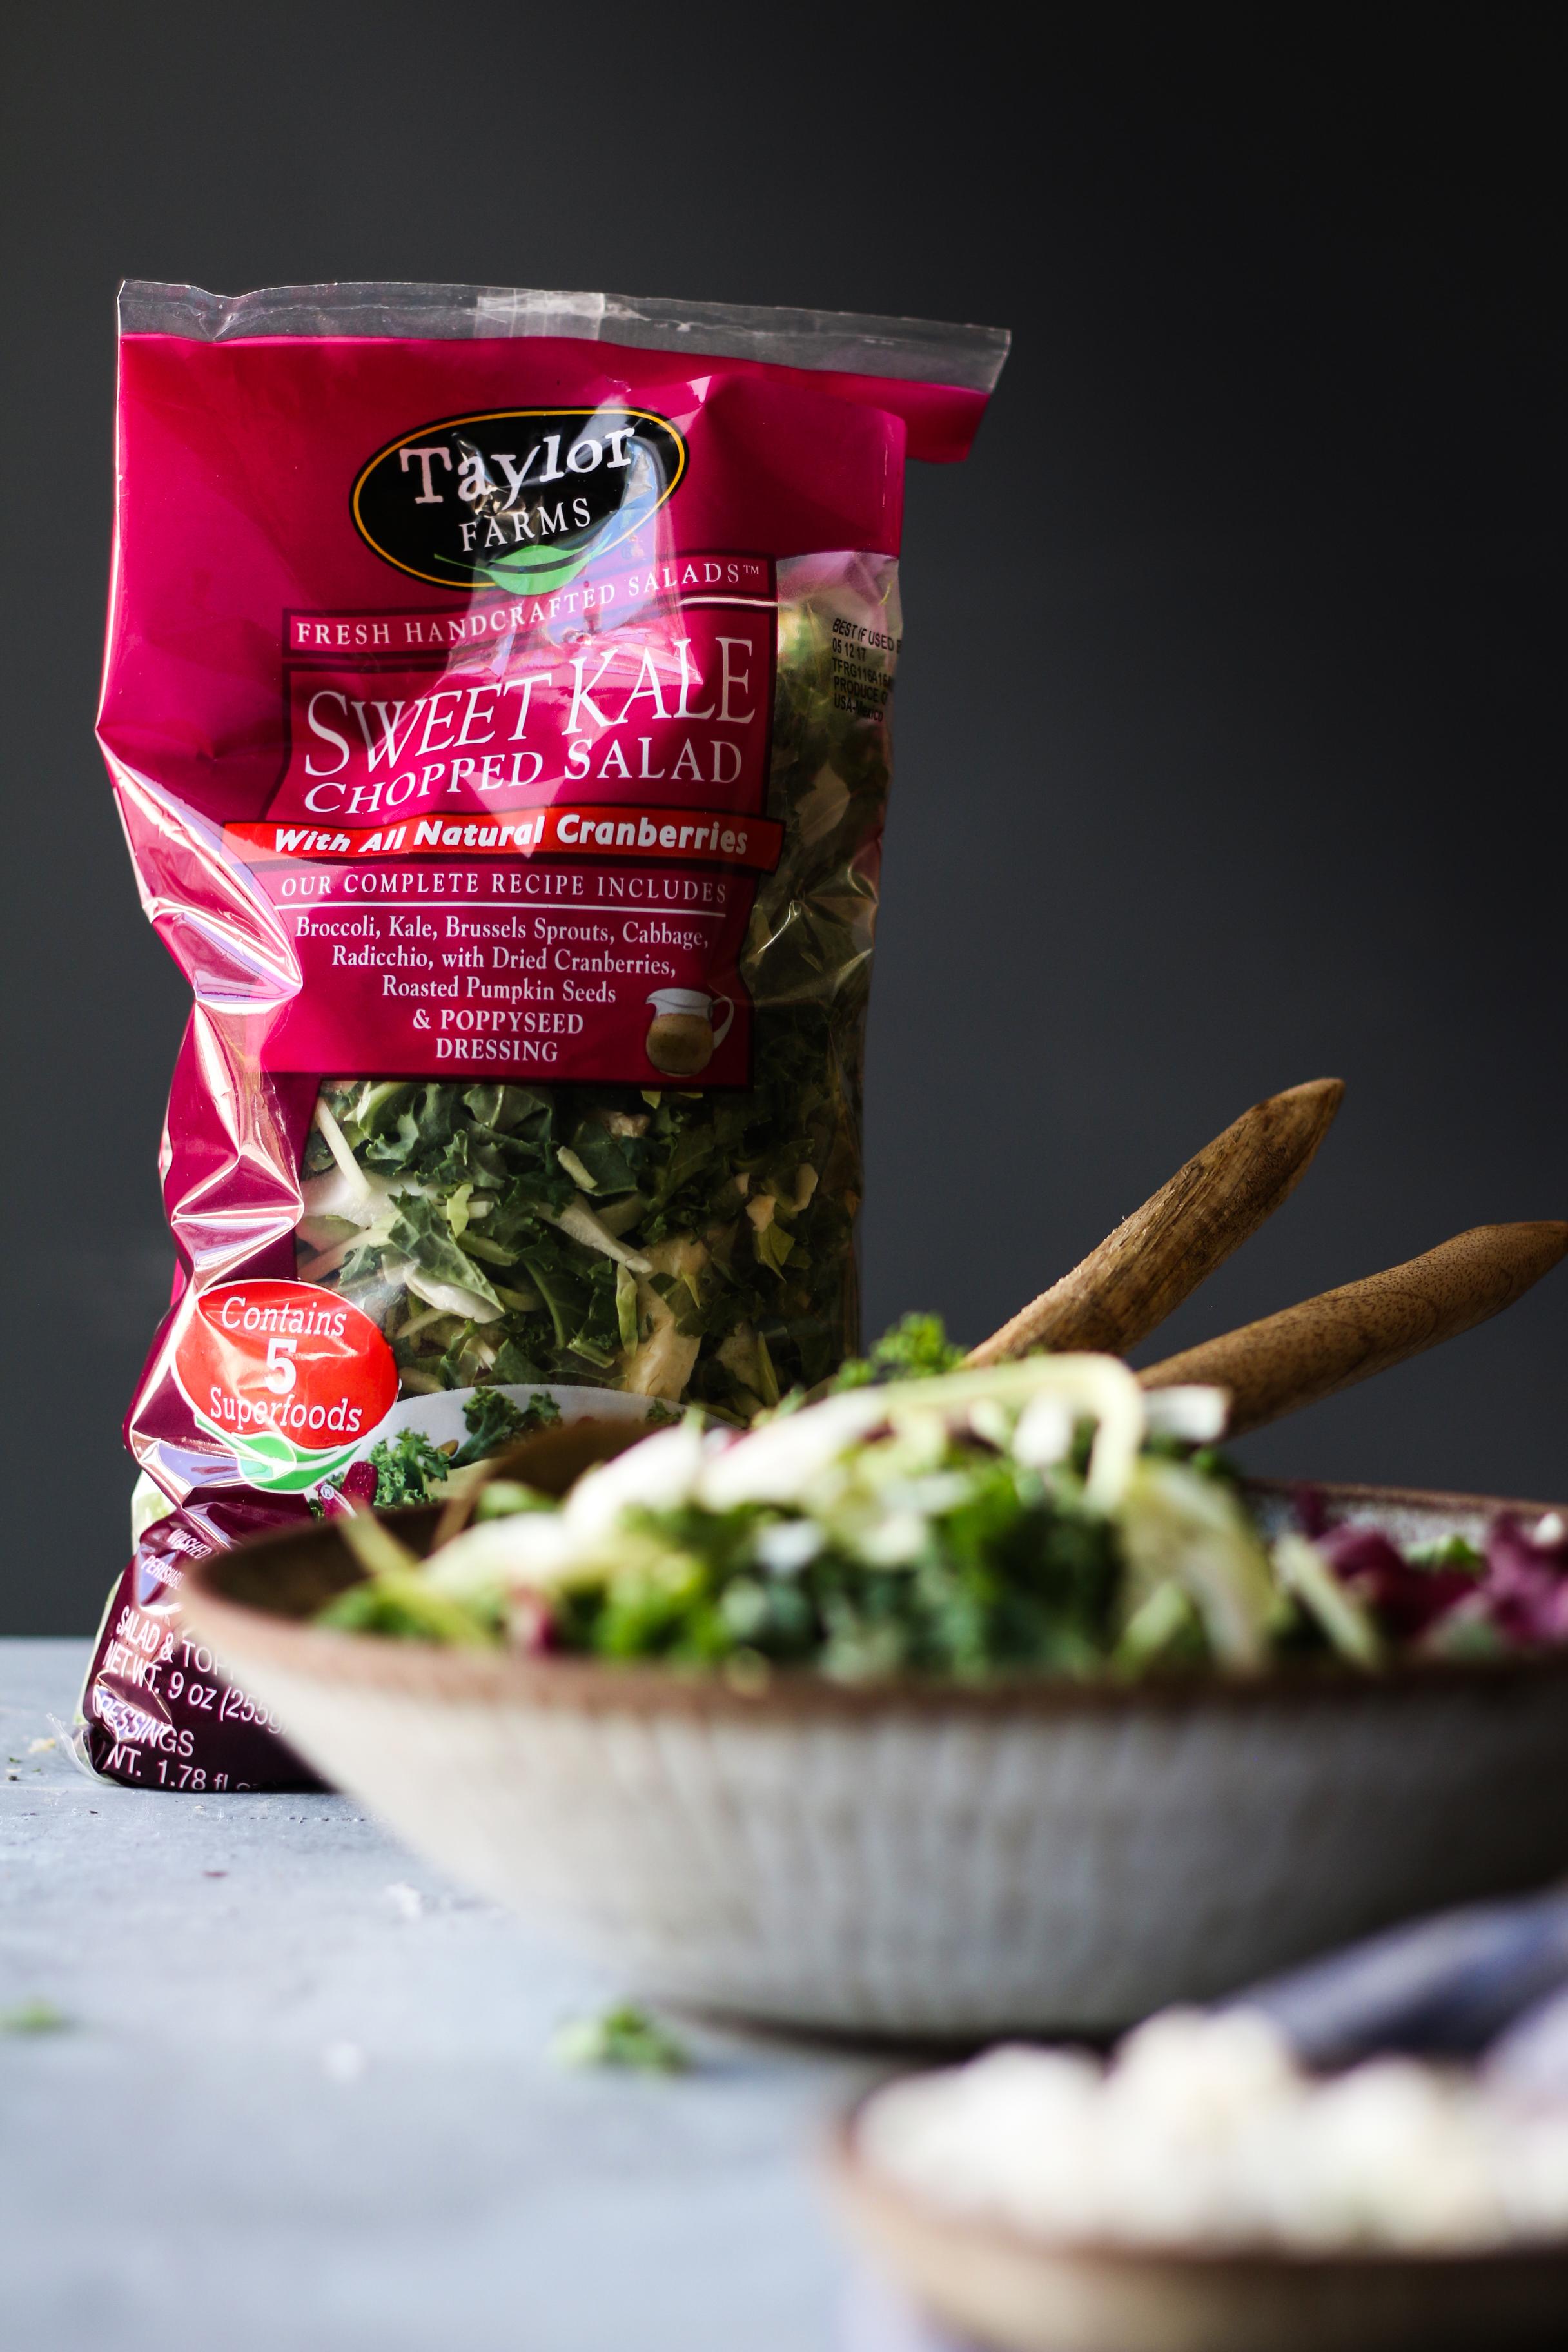 Rustic Spring Kale and Egg Tart |foodfashionparty| #sweetkaletart #springtart